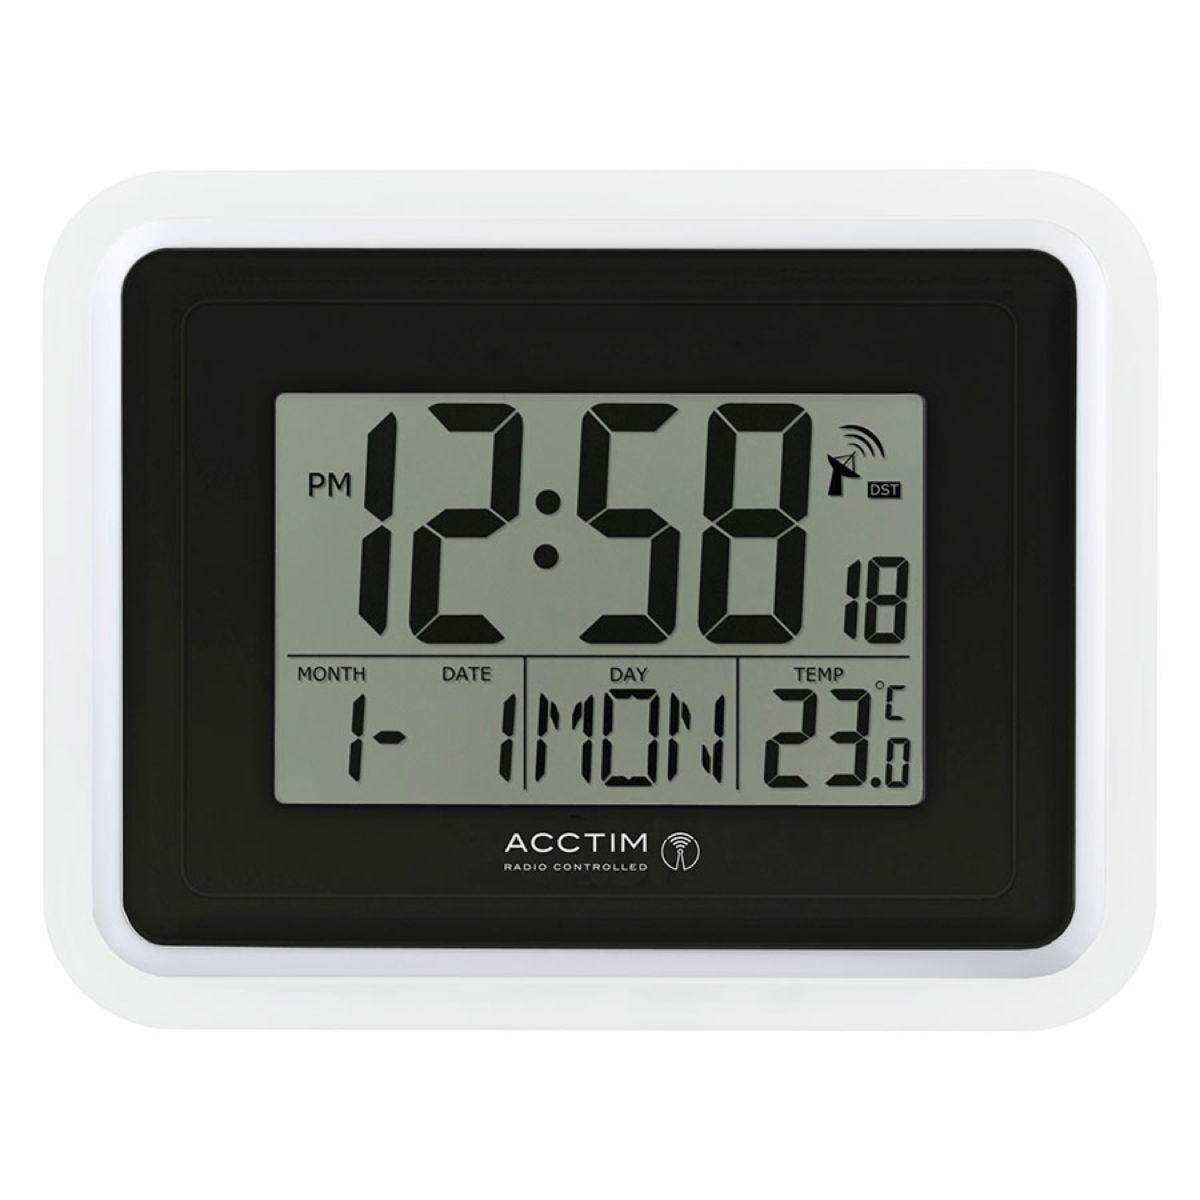 Acctim 'Delta' RC LCD Wall/Desk Clock